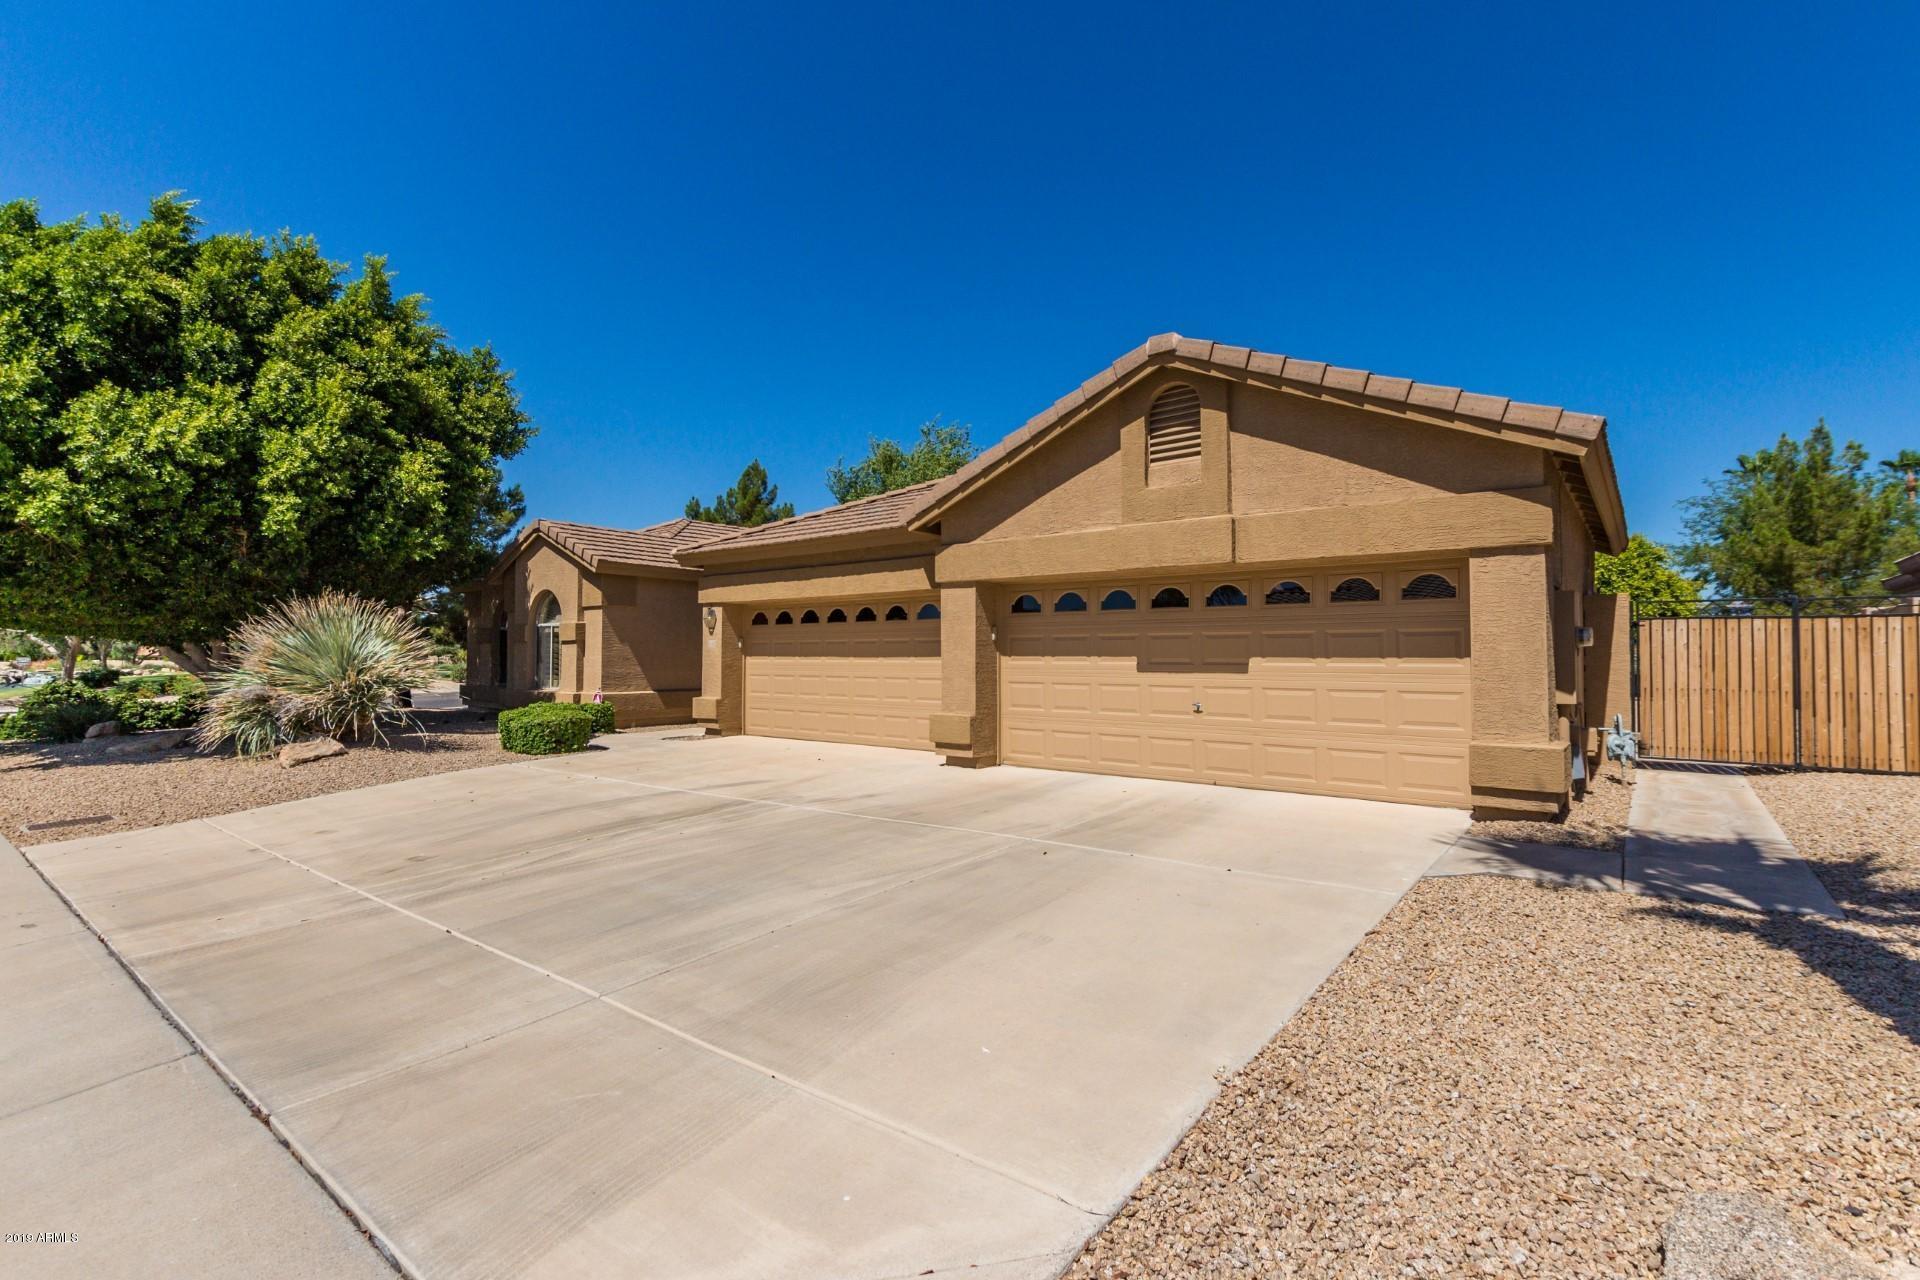 Photo of 21106 N 70TH Drive, Glendale, AZ 85308